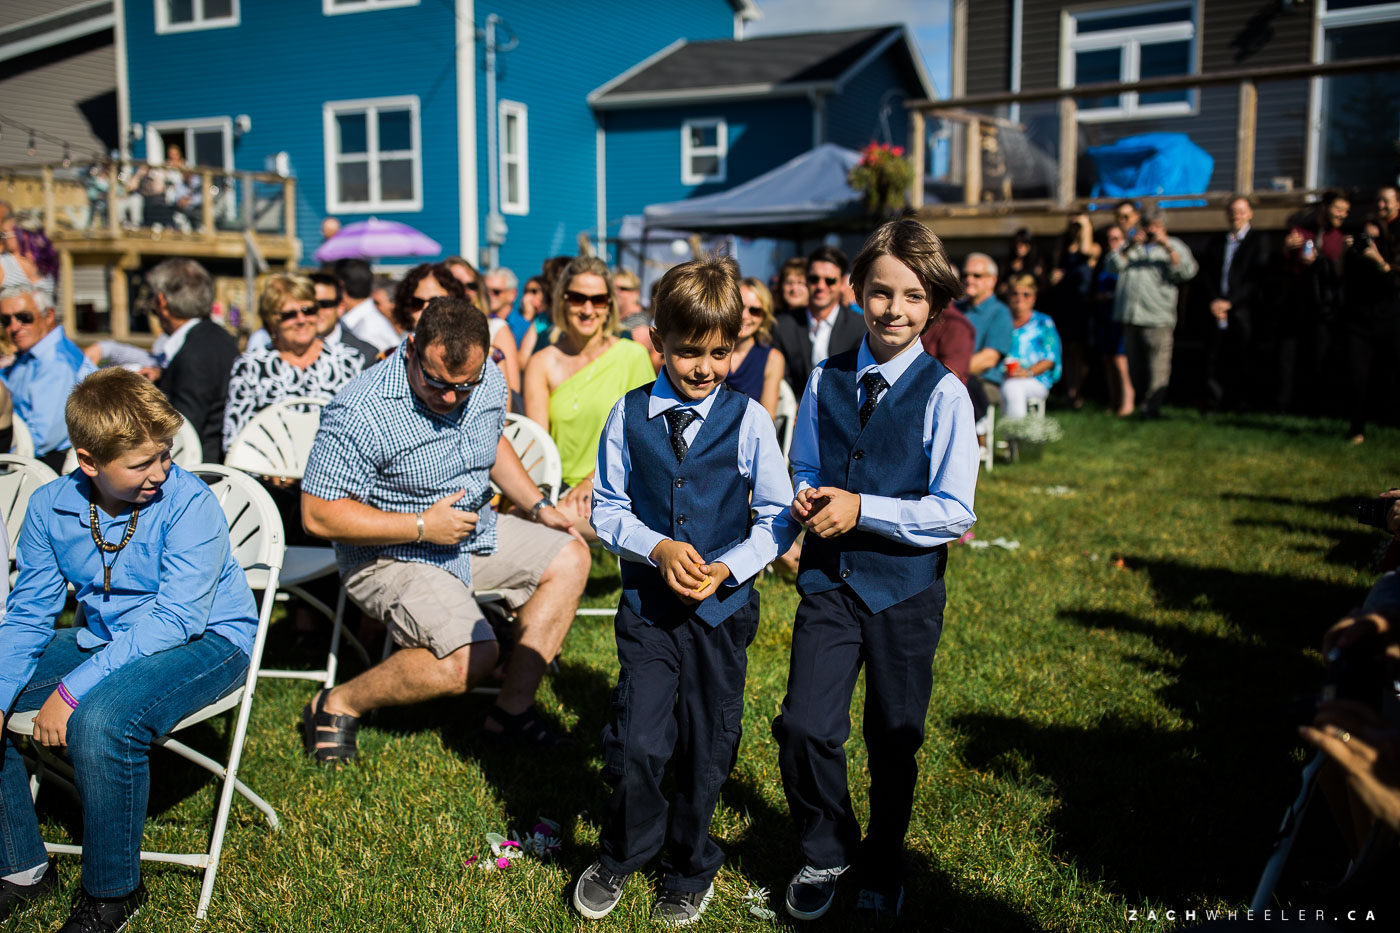 StJohns-Newfoundland-Backyard-Wedding-17